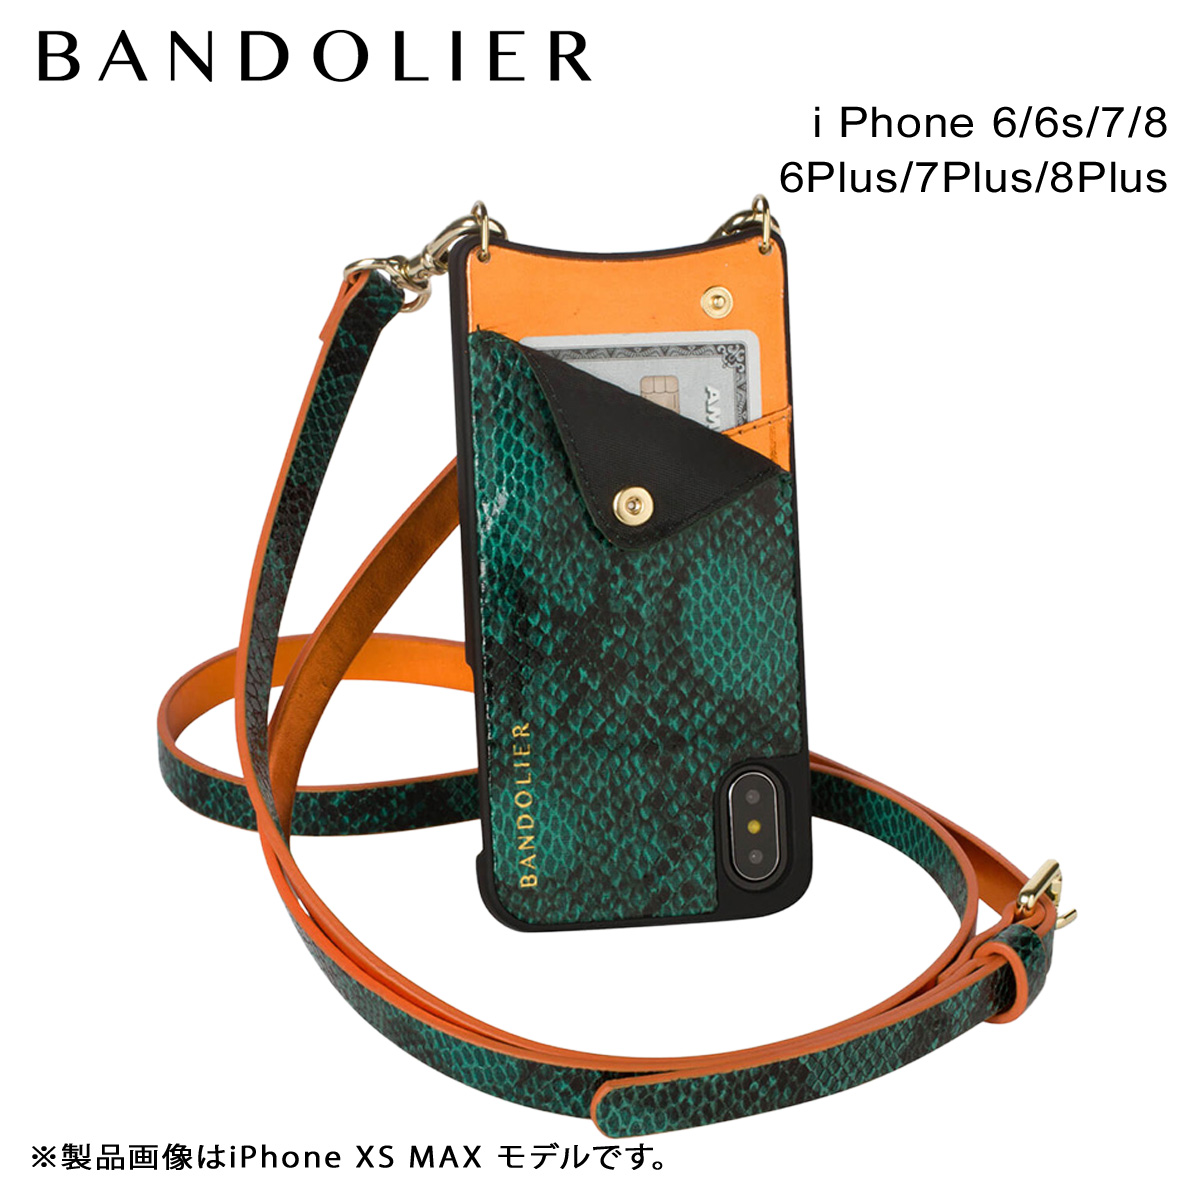 BANDOLIER バンドリヤー iPhone8 iPhone7 7Plus 6s ケース スマホ アイフォン プラス EMMA GREEN SNAKE メンズ レディース グリーン [6/1 新入荷] 【決算セール 返品不可】